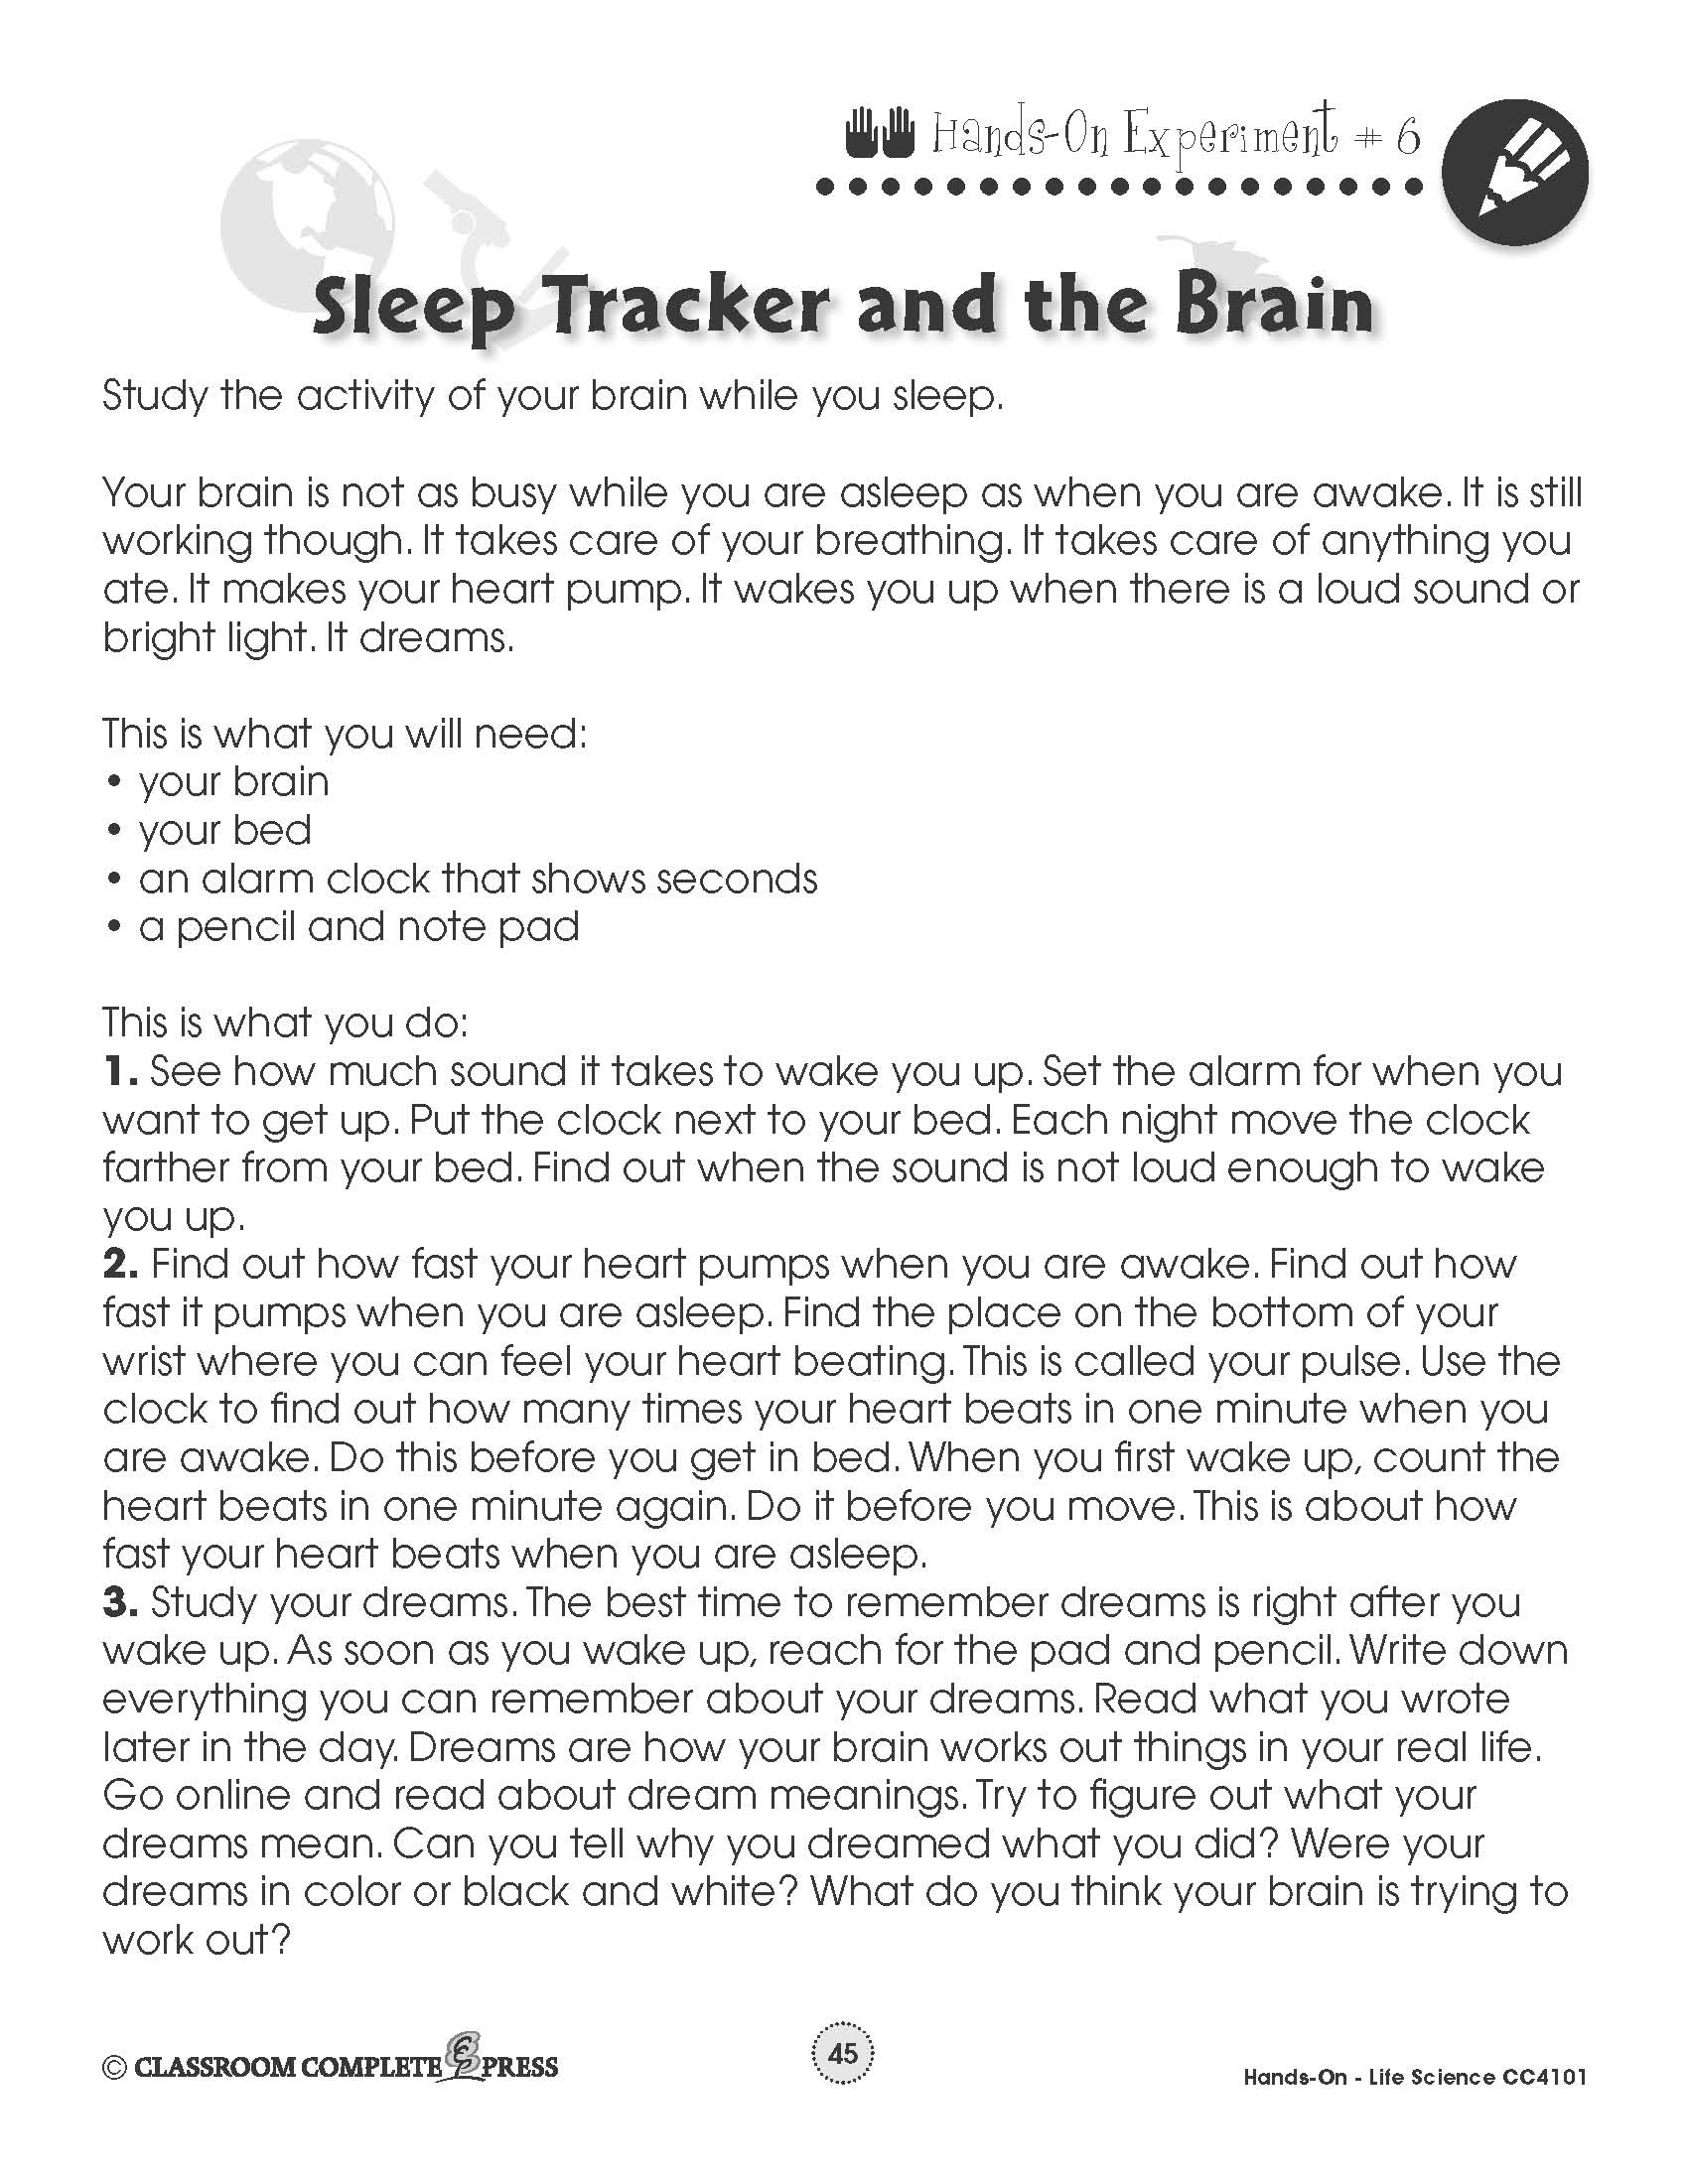 Life Science Sleep Tracker